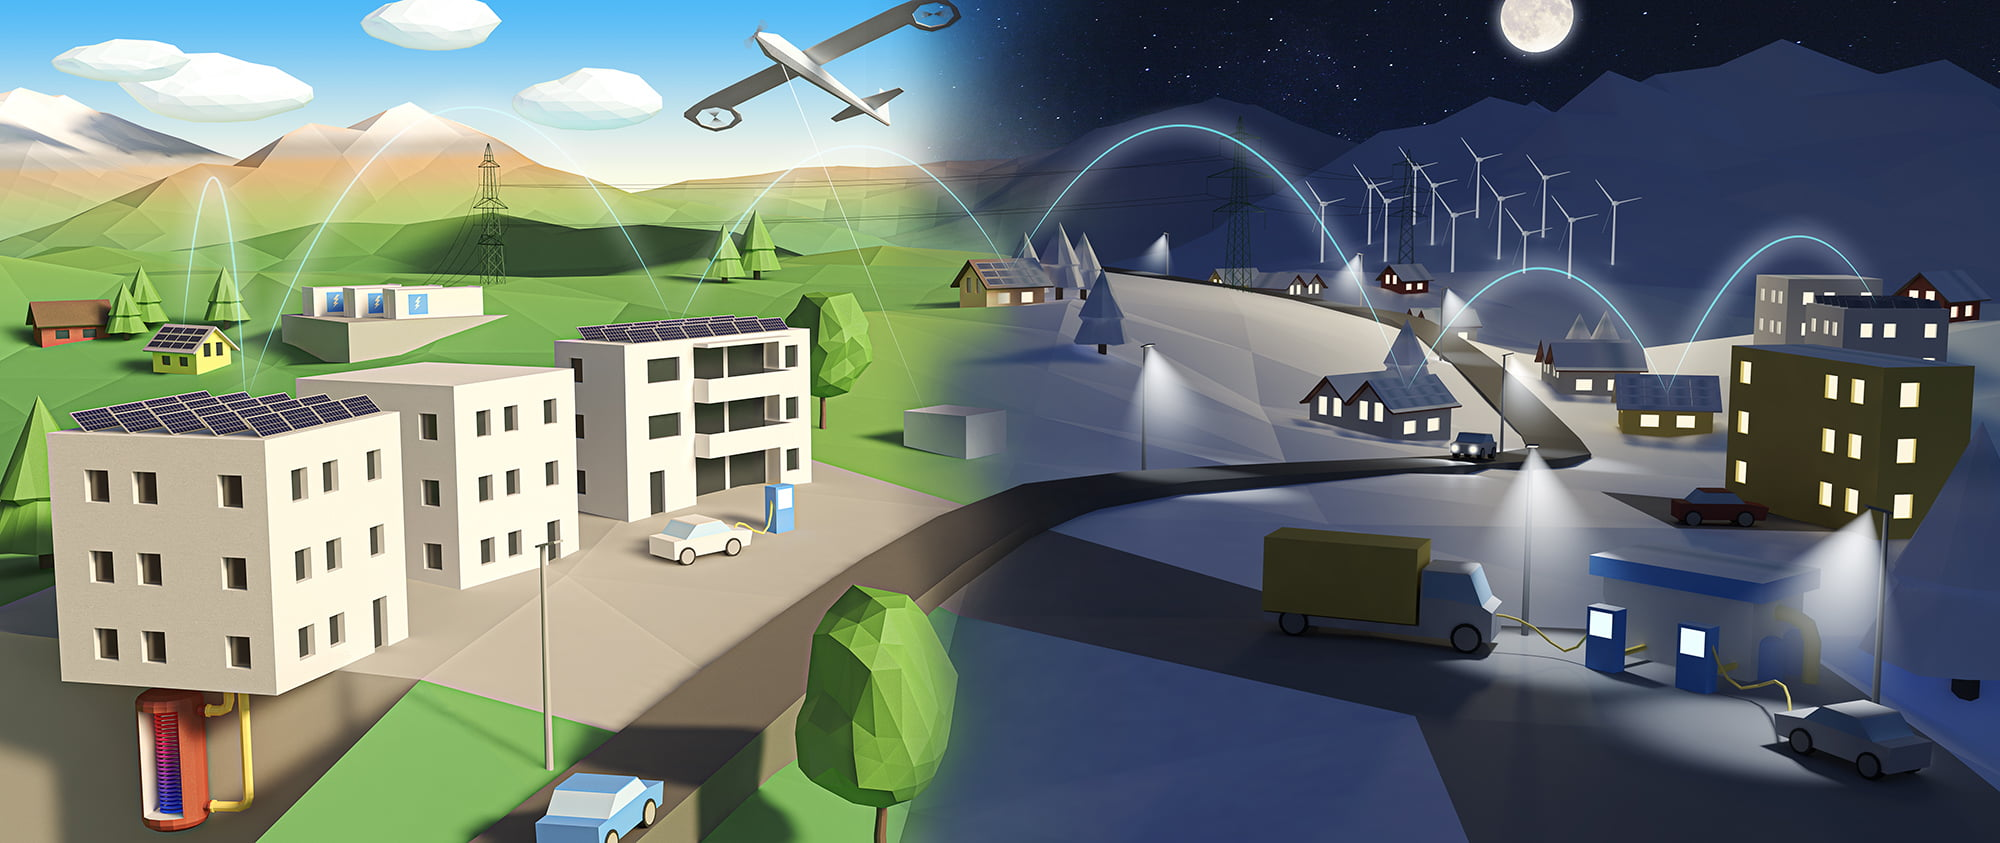 Energiezukunft_Visualisierung_Empa_ikonaut